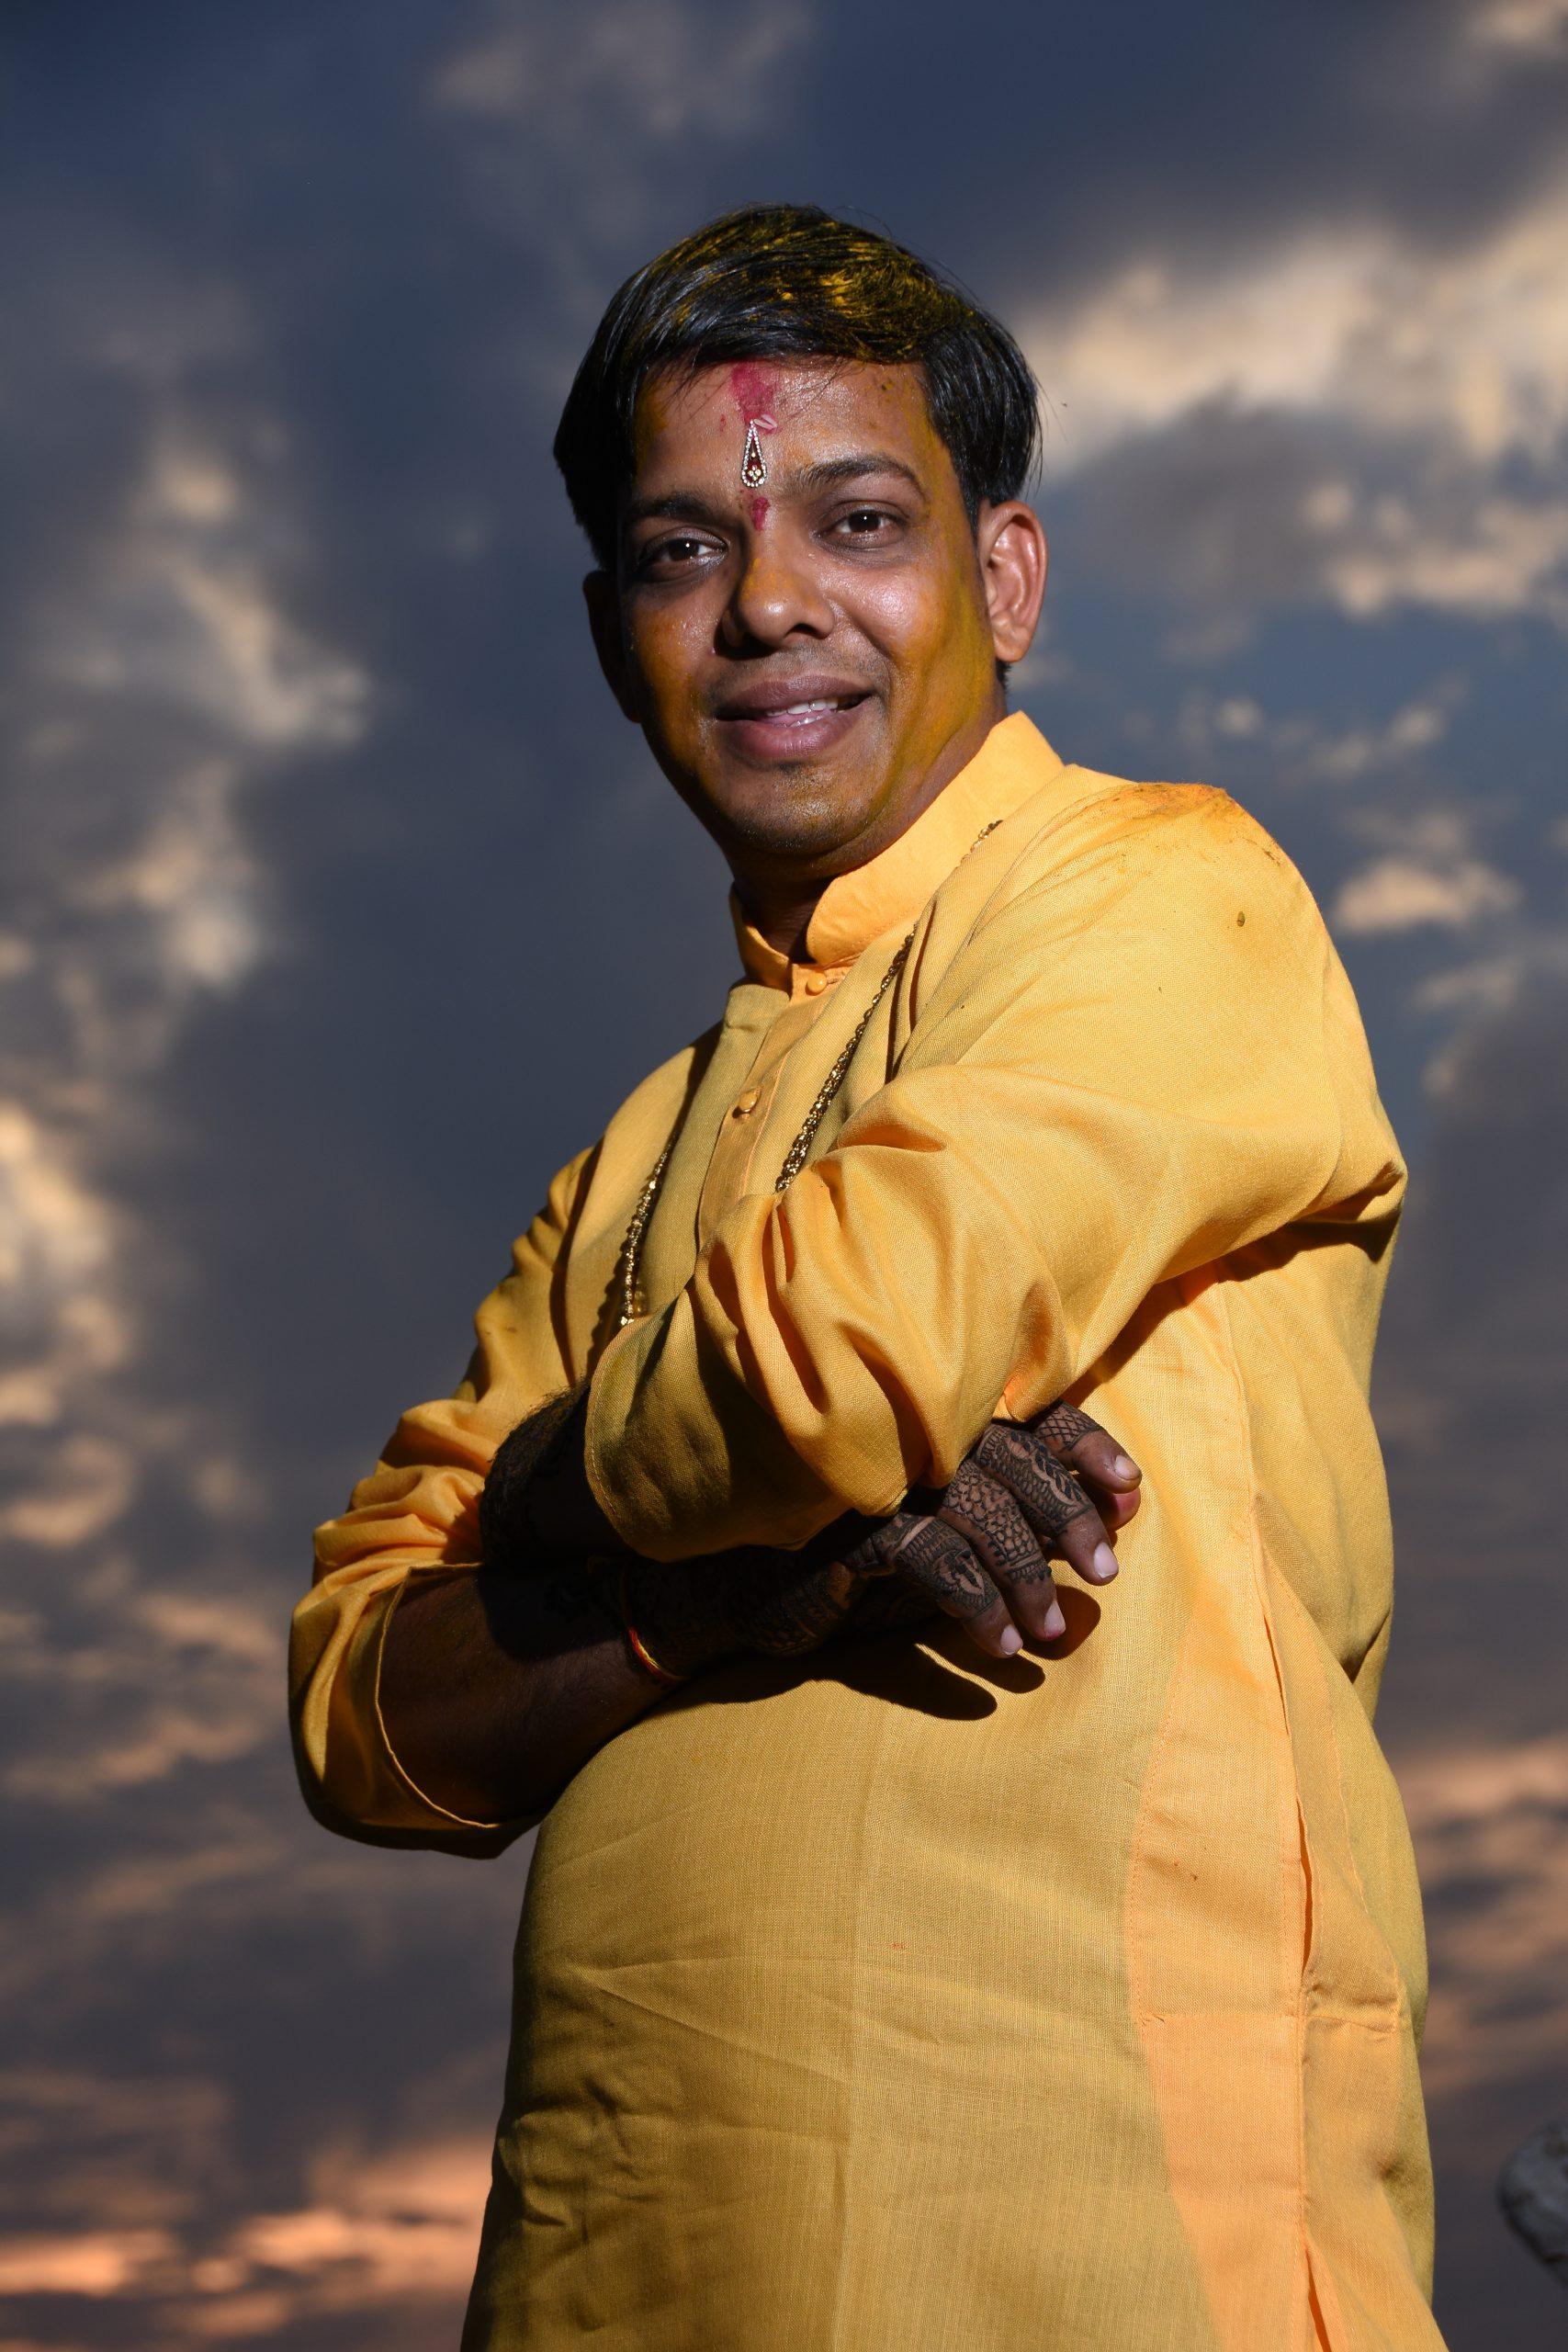 An Indian man